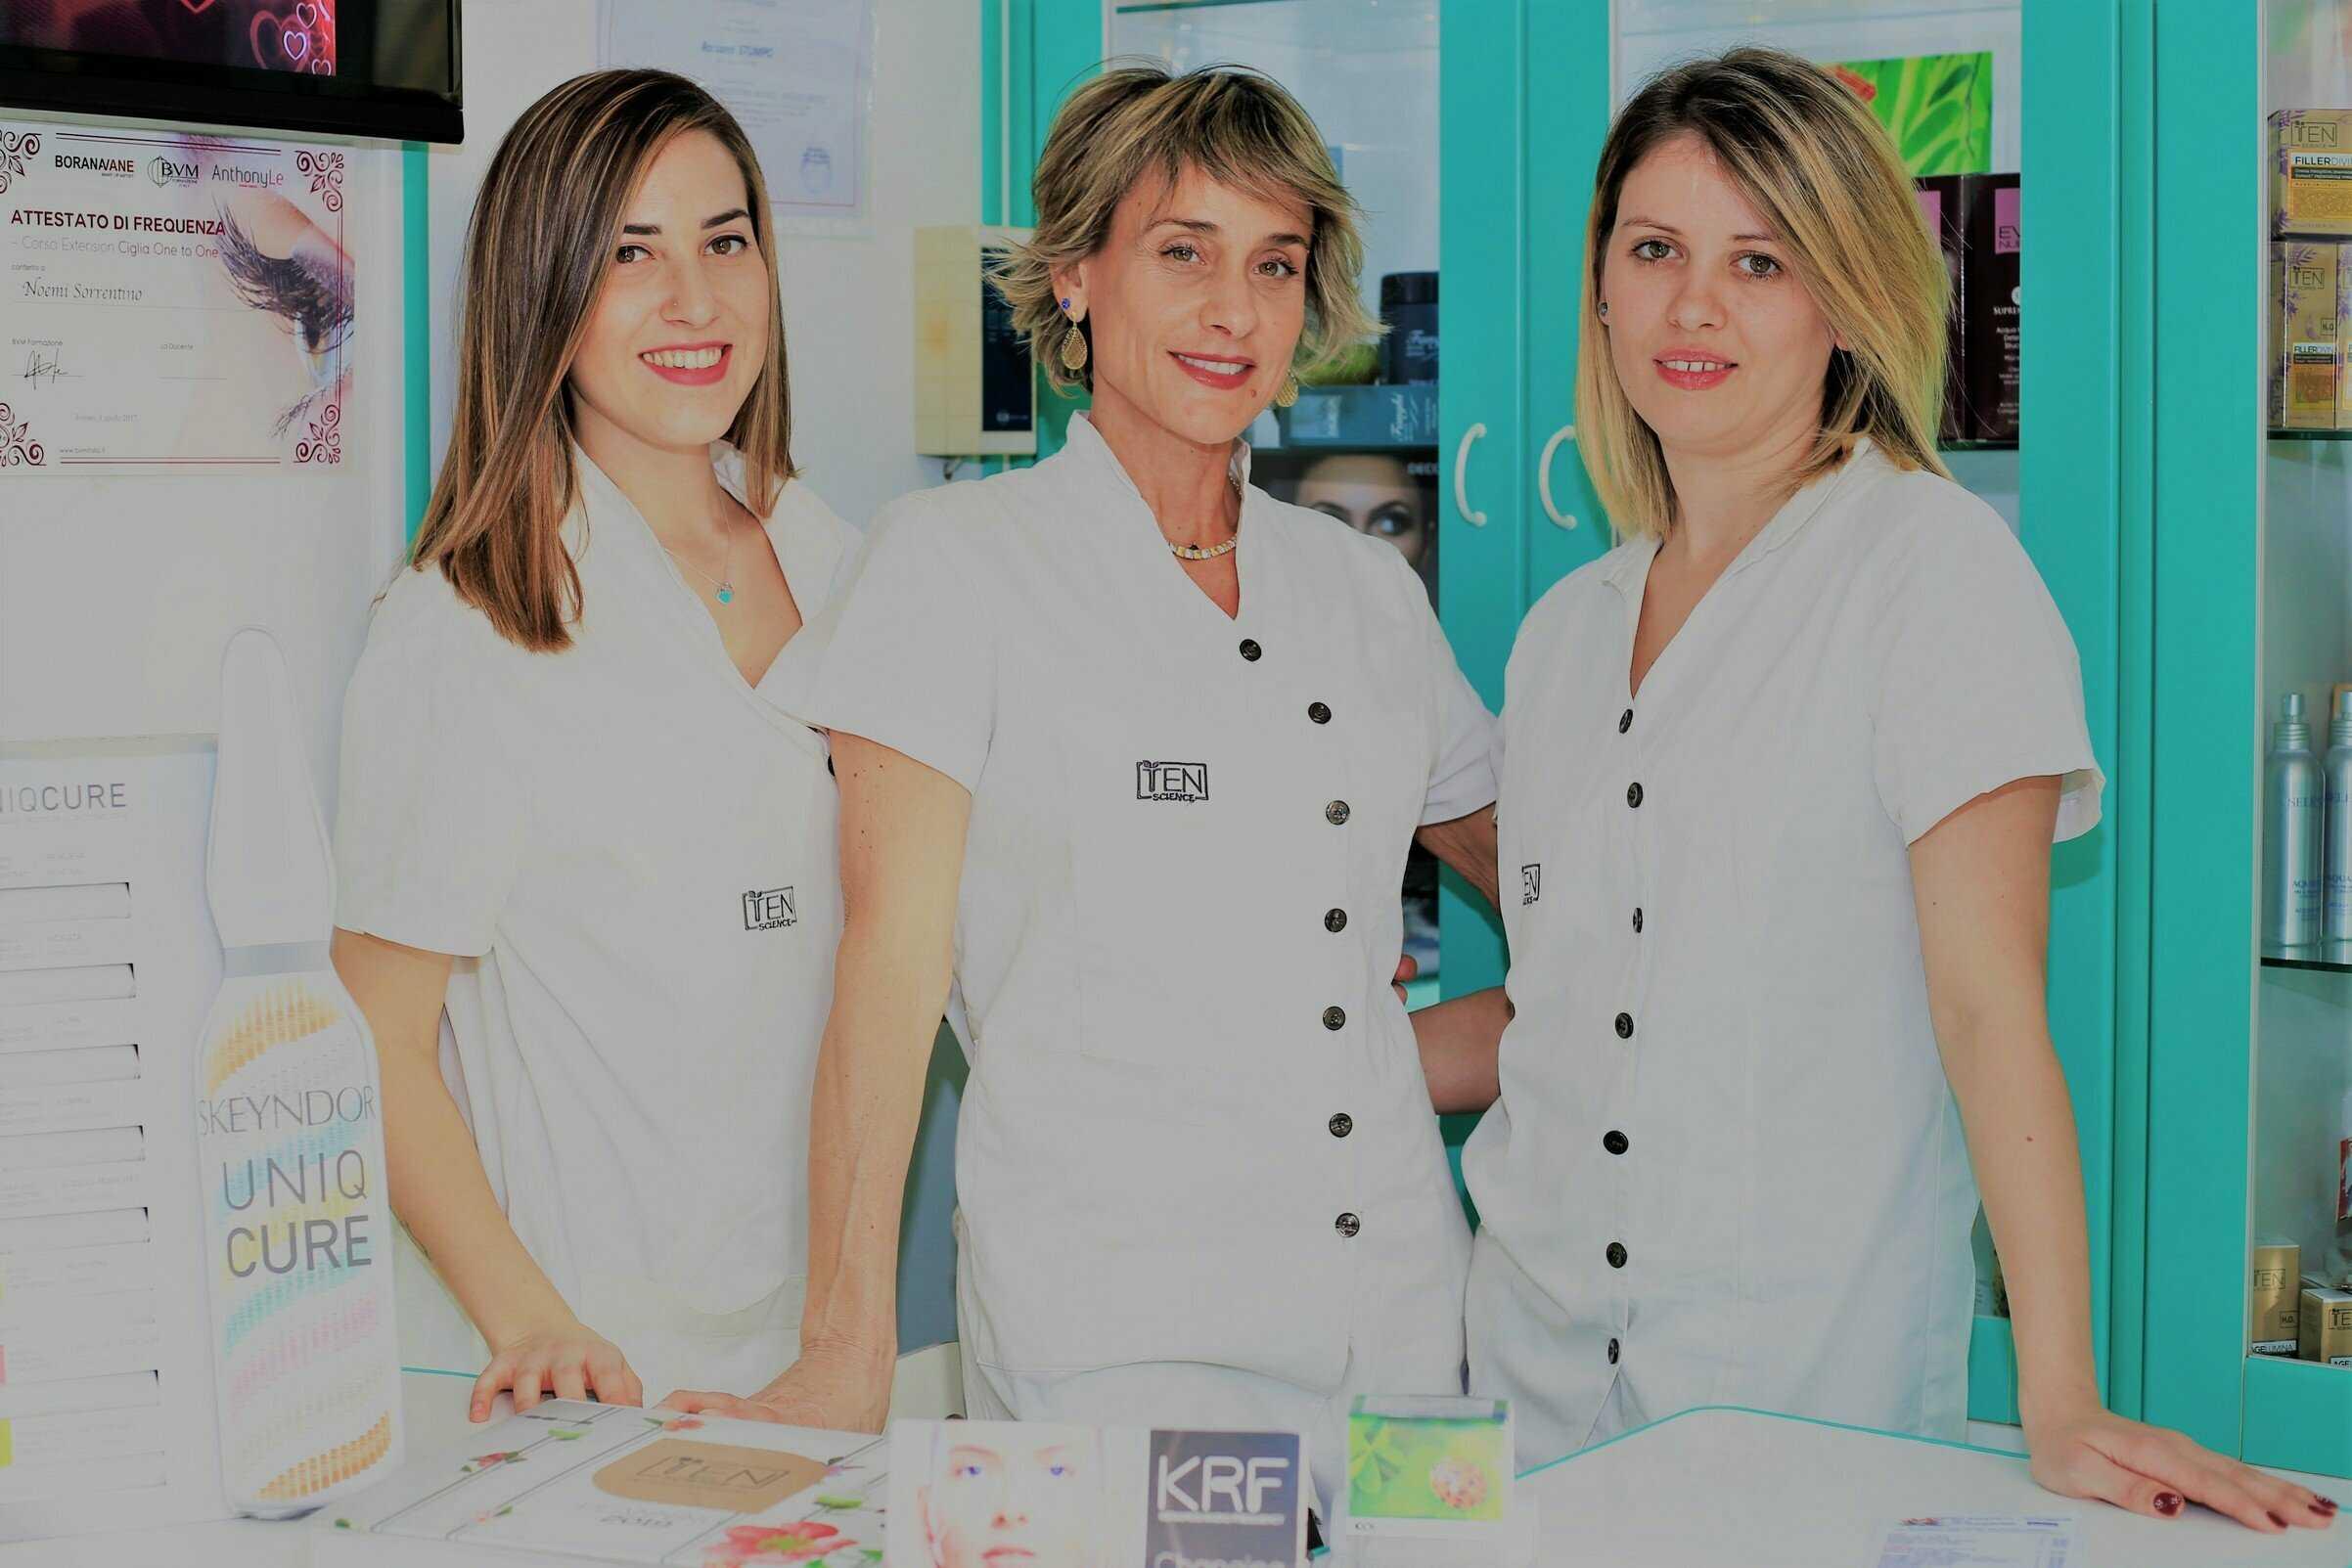 Staff - Centro Estetico Rossana